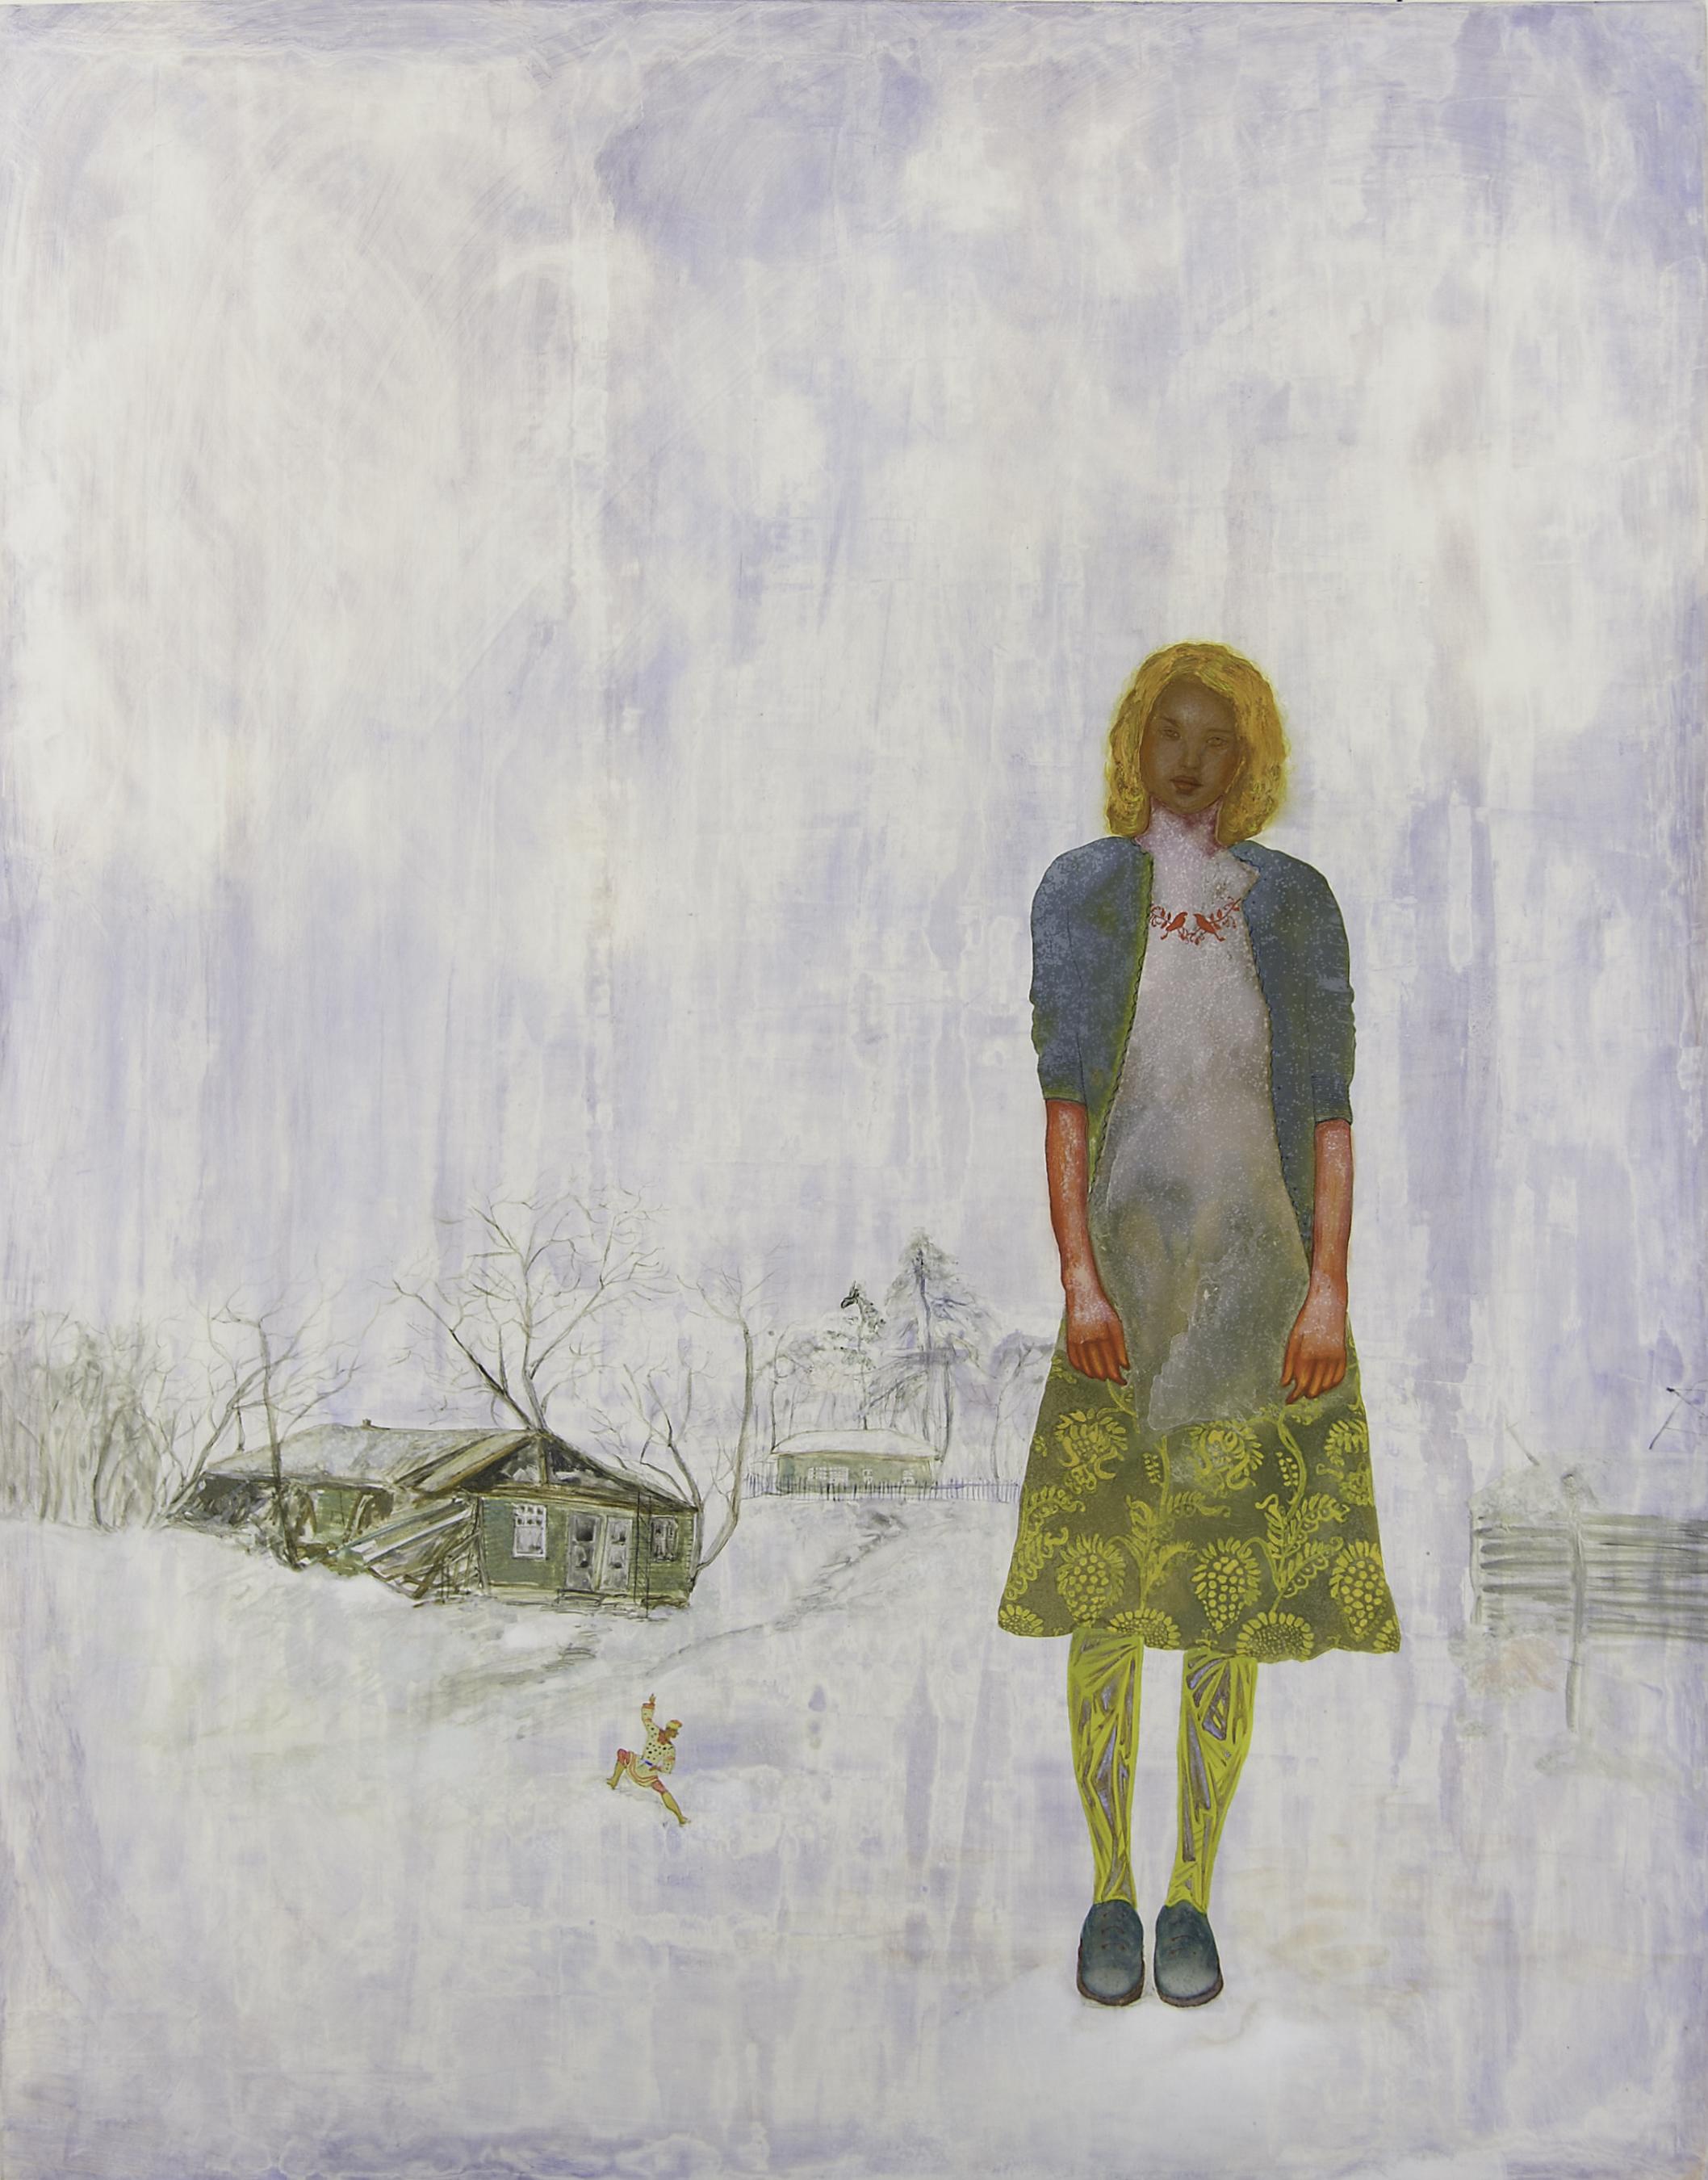 SMIRNOFF A Girl on The Snow Ball, 90x70, Egg Tempera on Wood, 2007.jpg